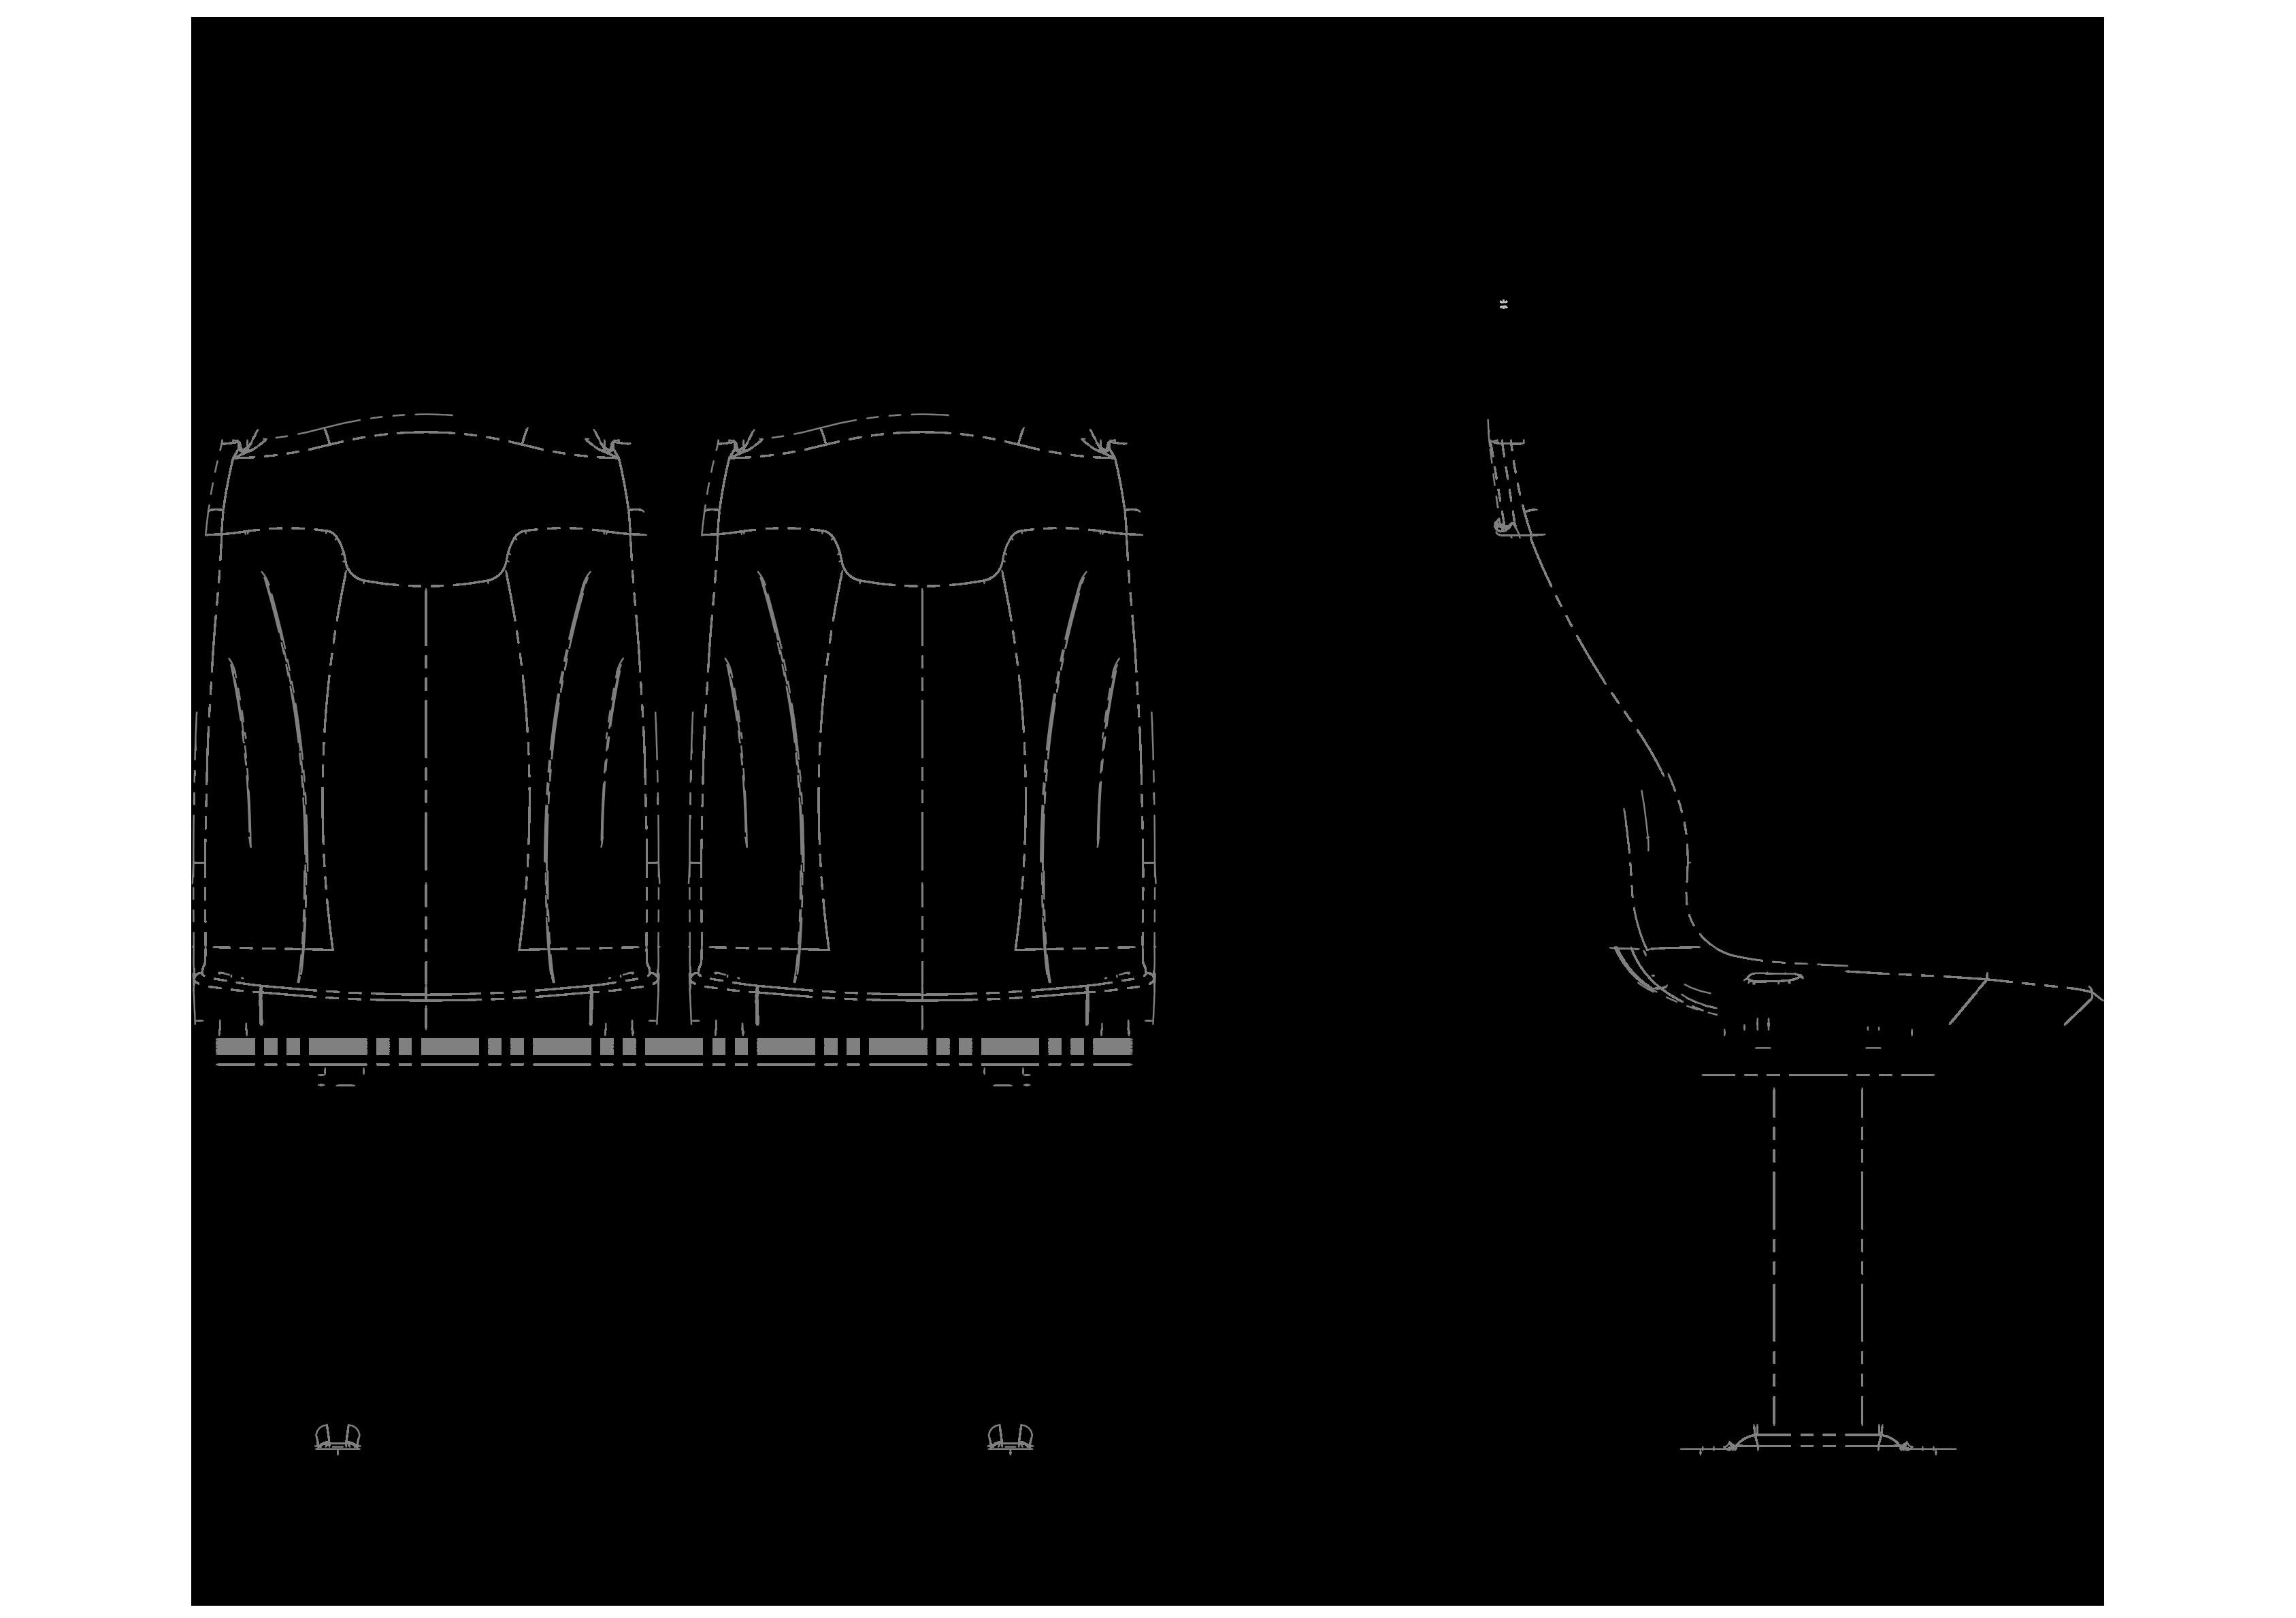 GS132(kumaşlı) teknik çizimi